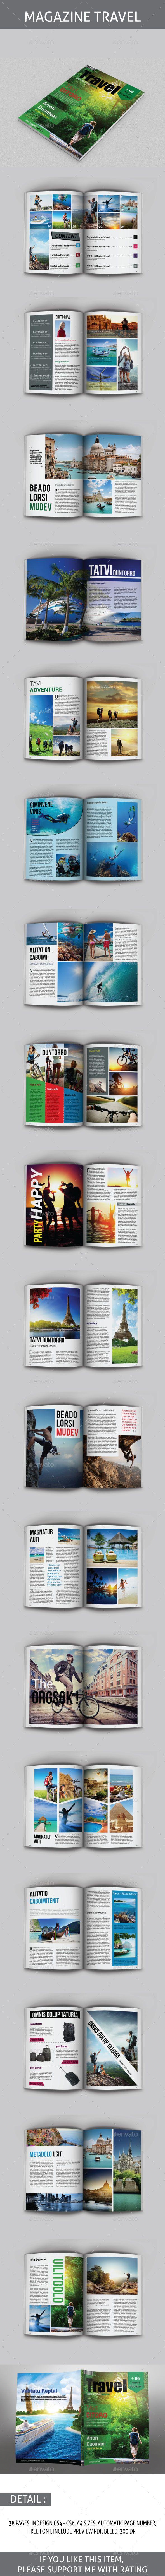 Travel Magazine Template